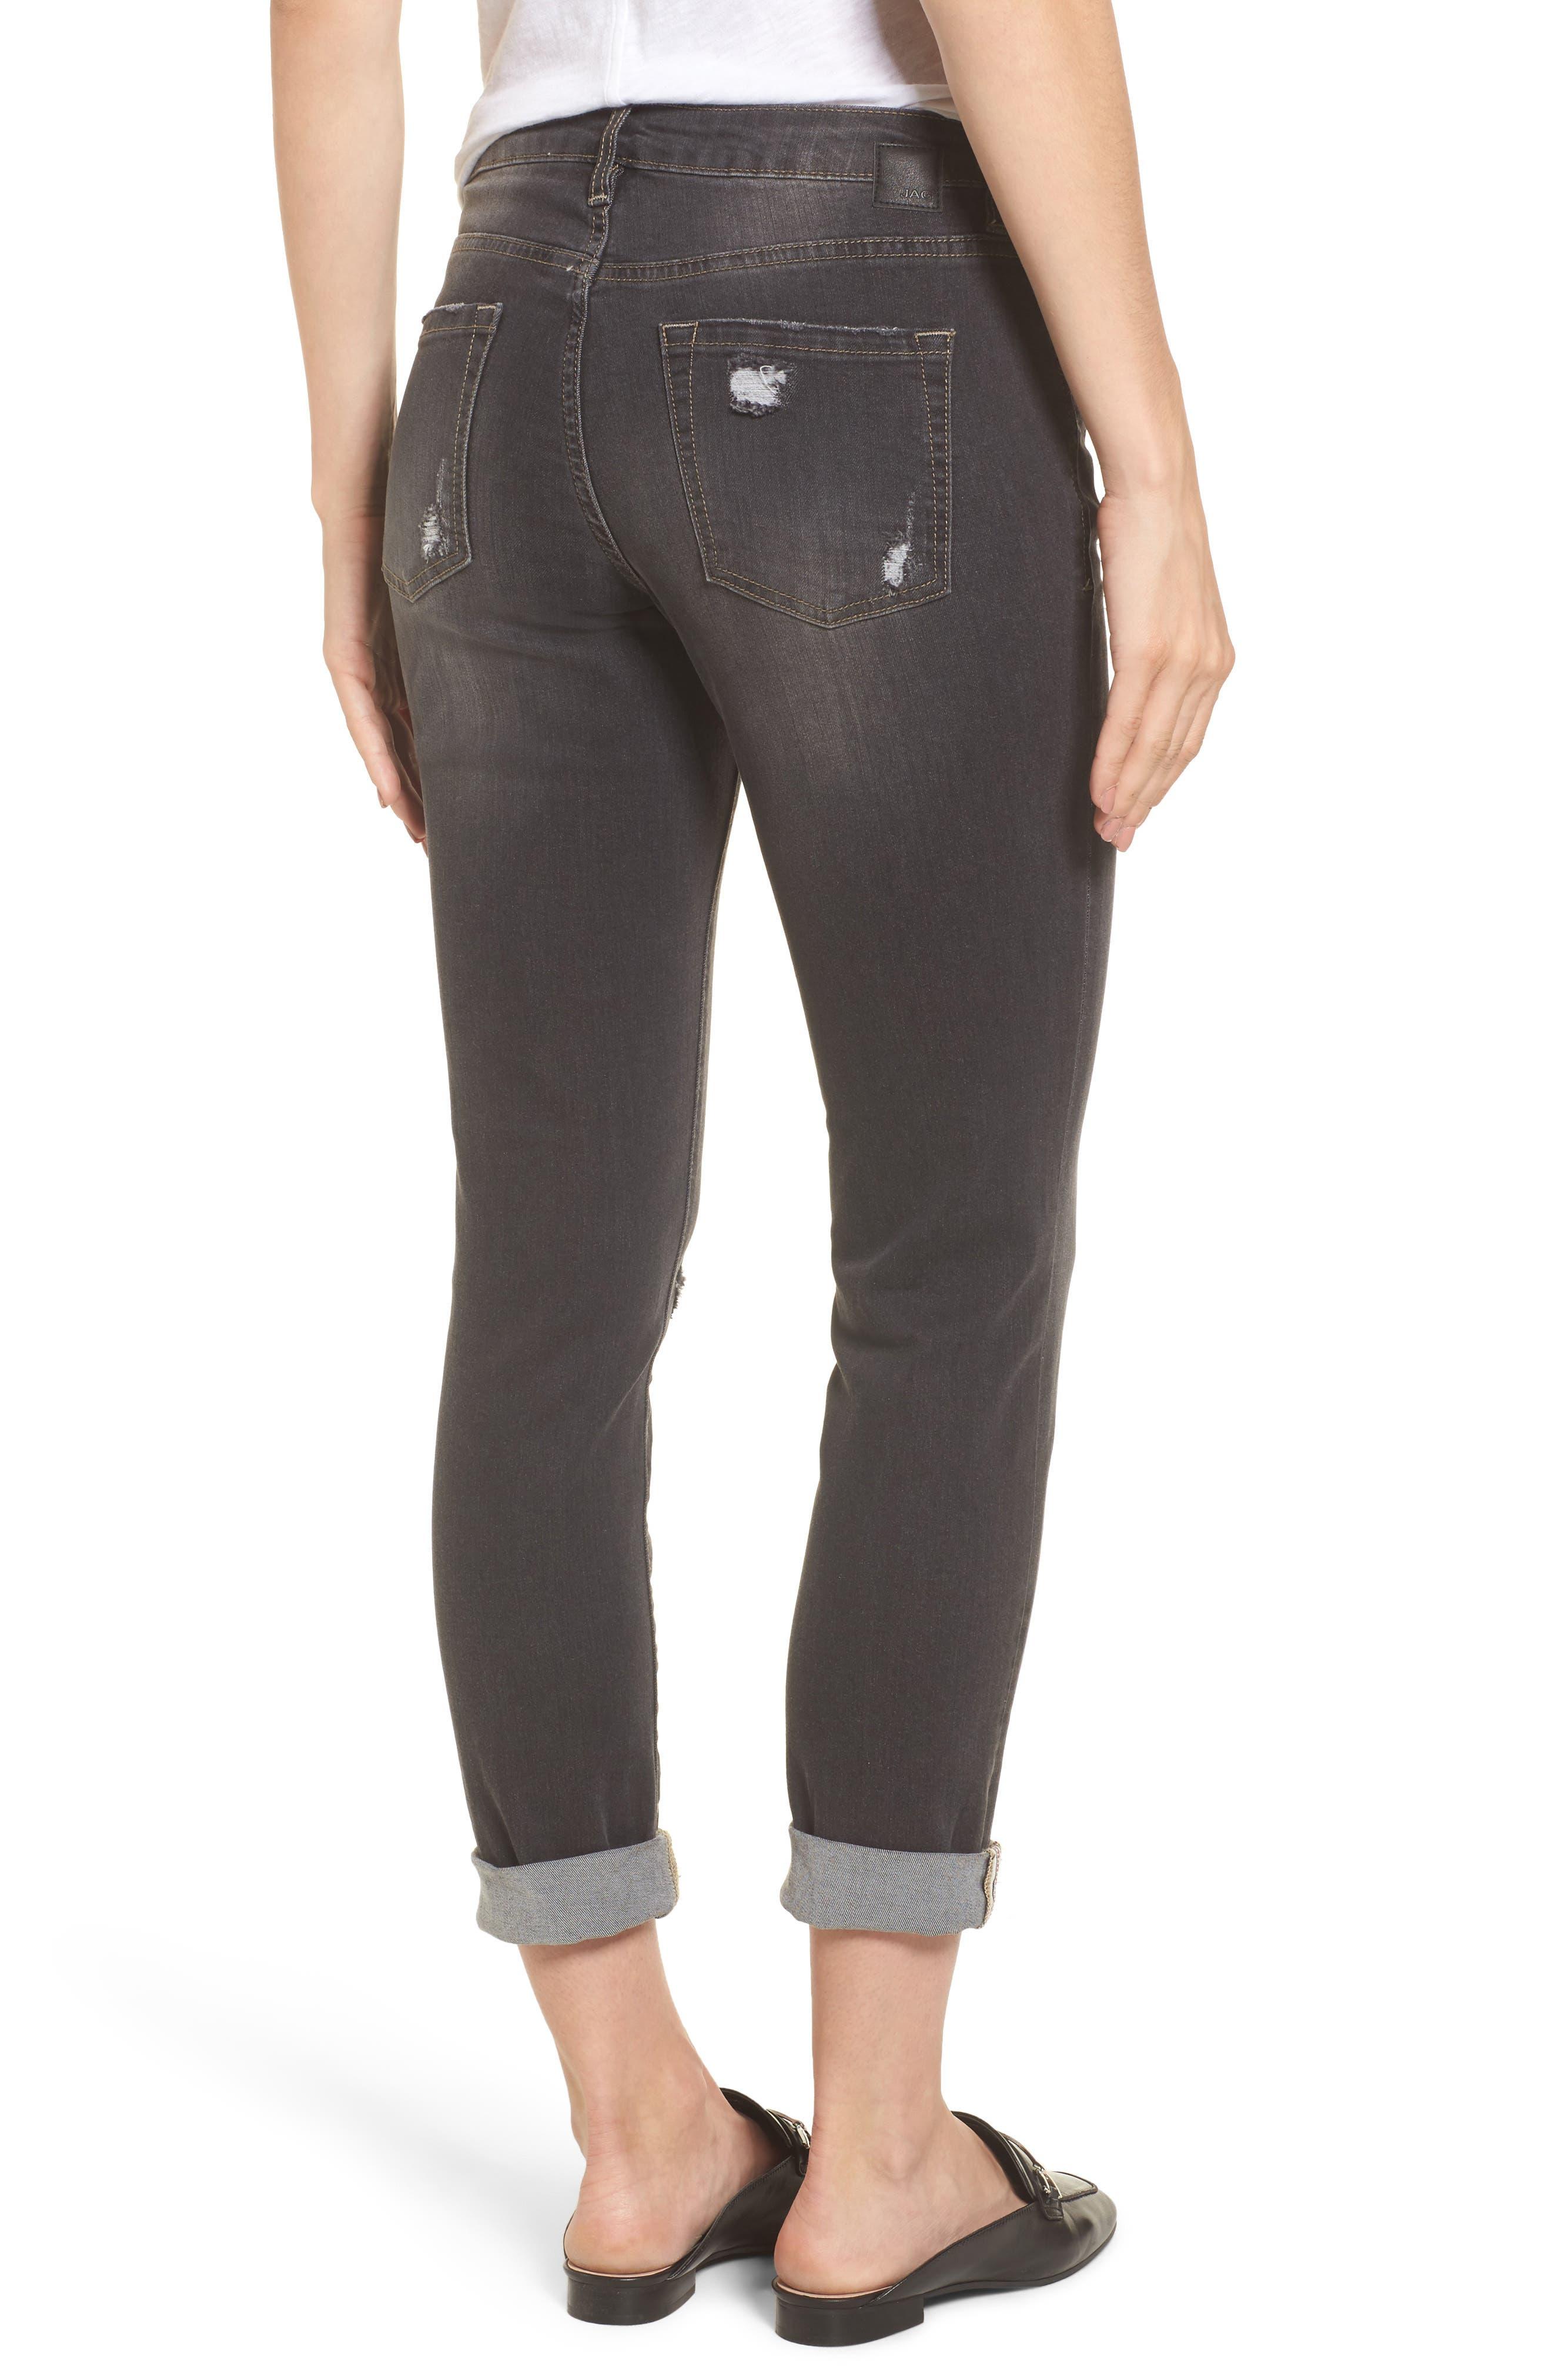 Alternate Image 2  - Jag Jeans Carter Cuffed Girlfriend Jeans